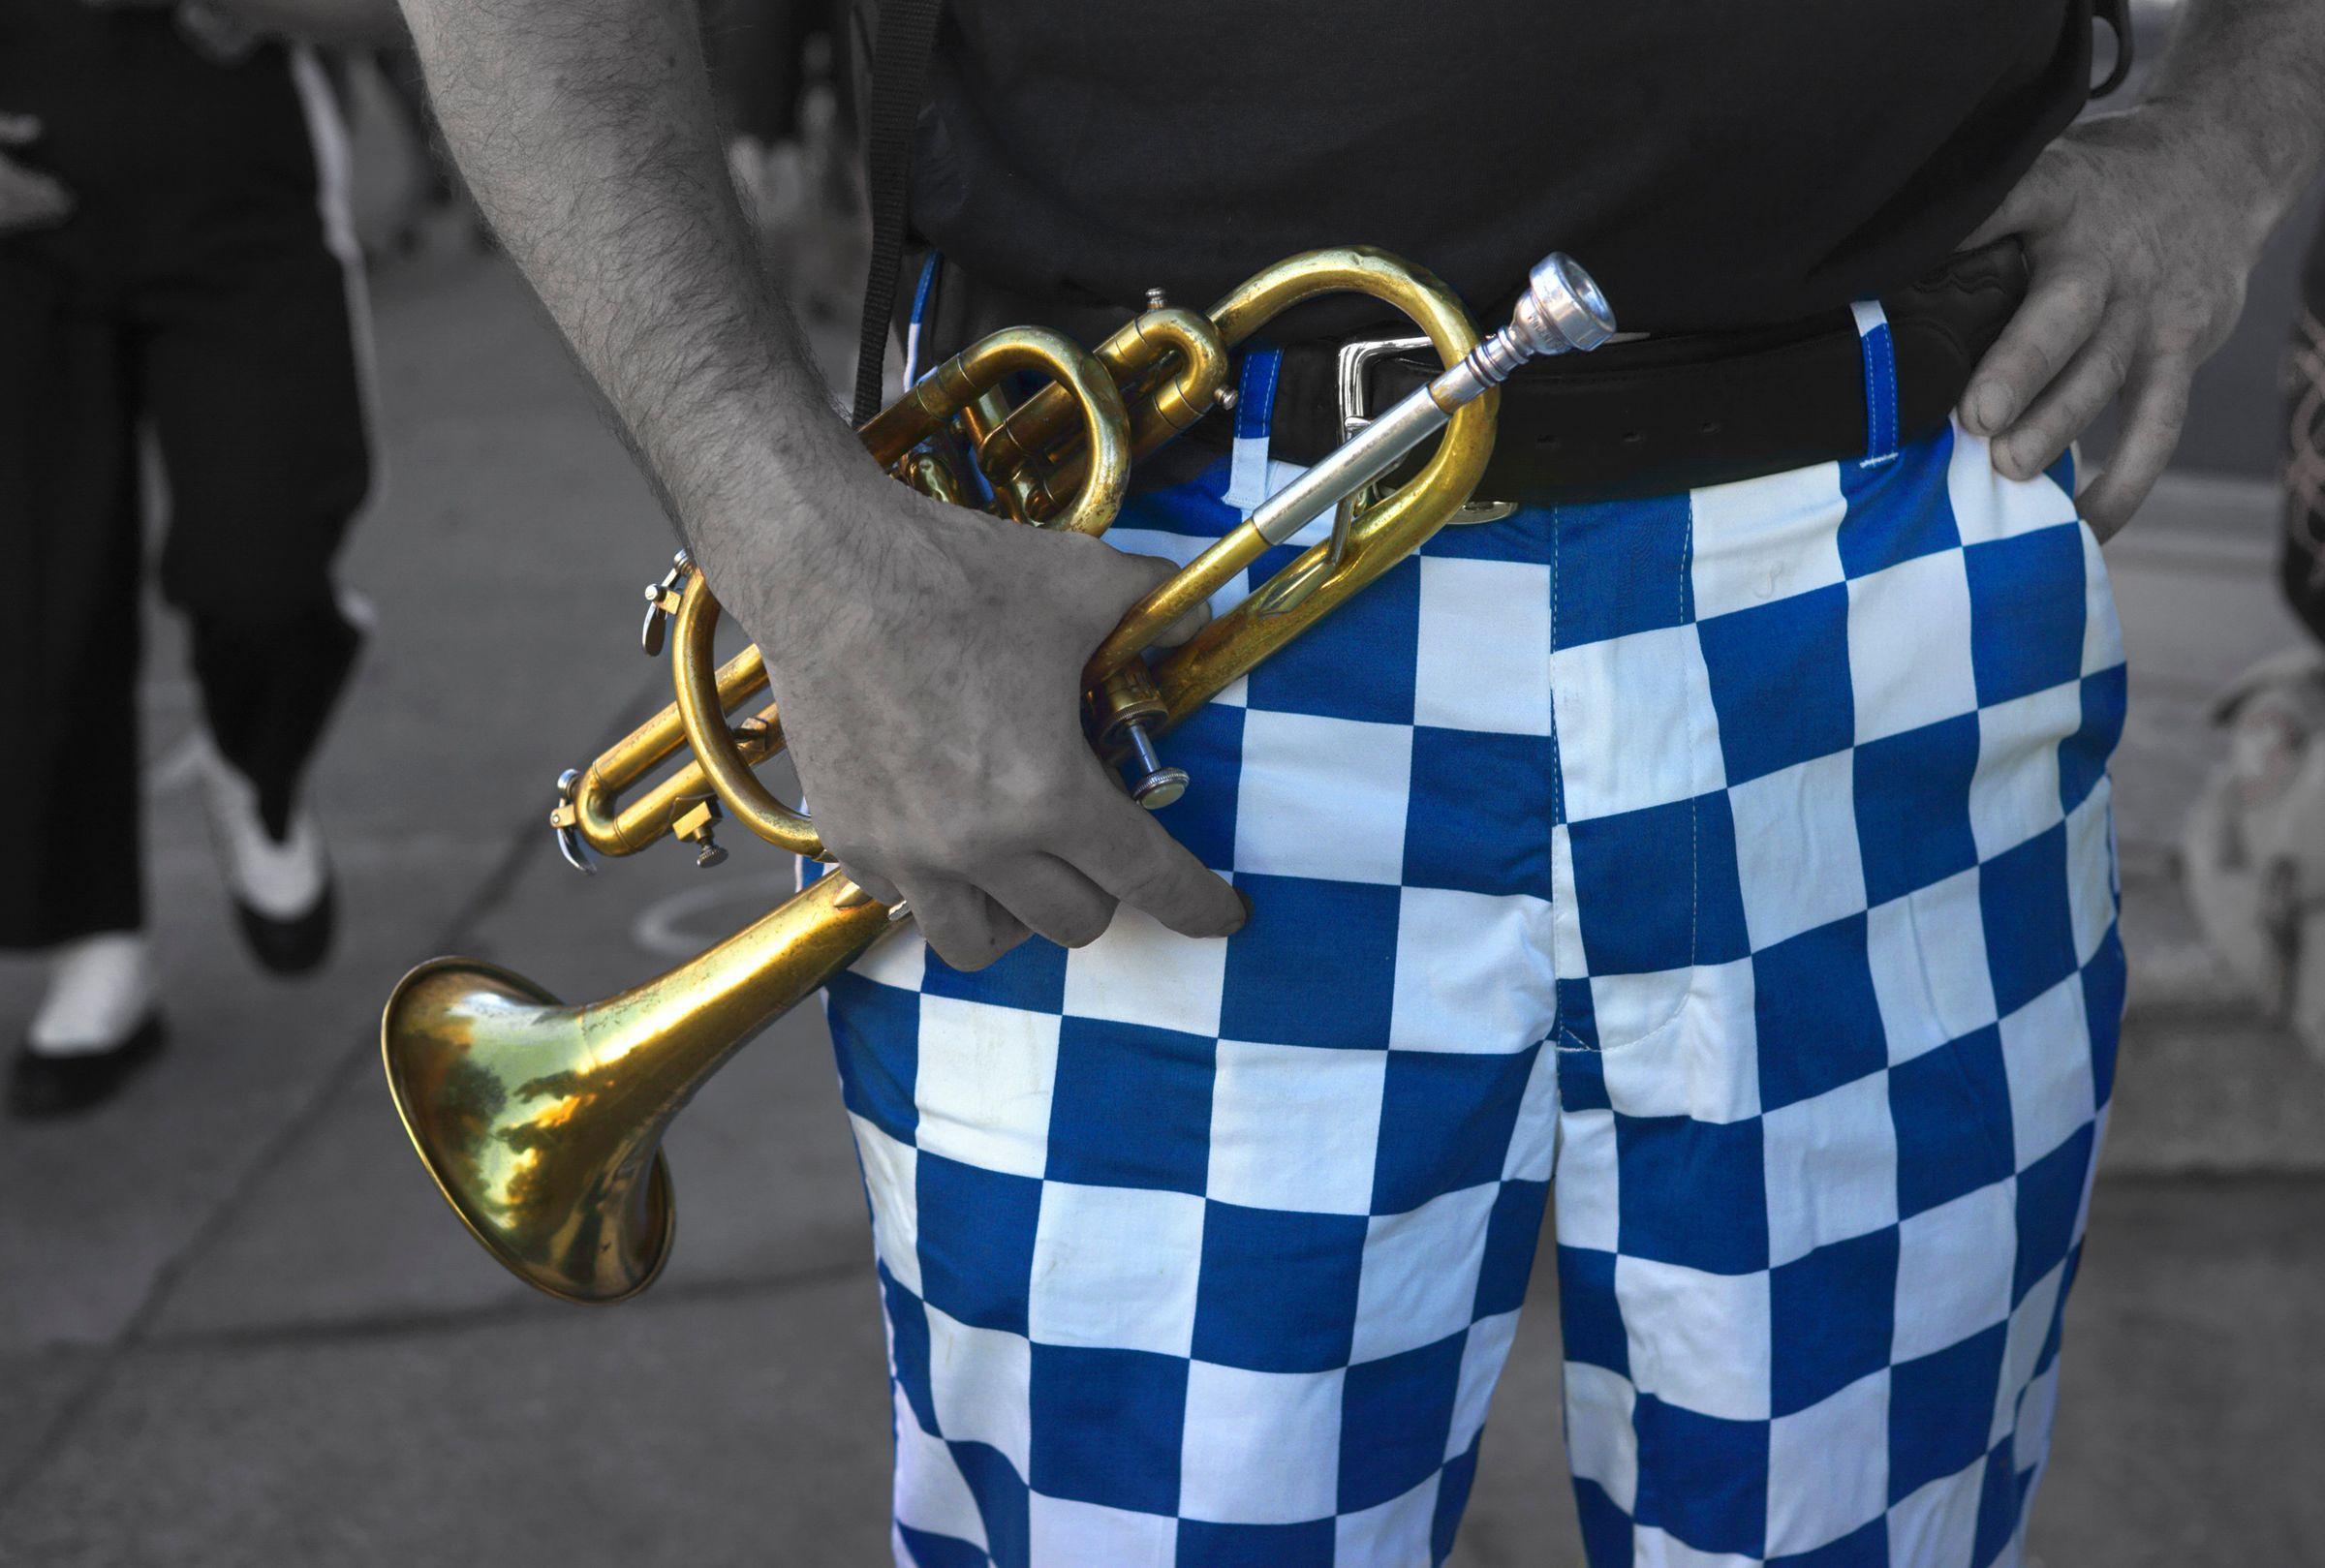 Trumpet W/ Checked Pants, San Francisco